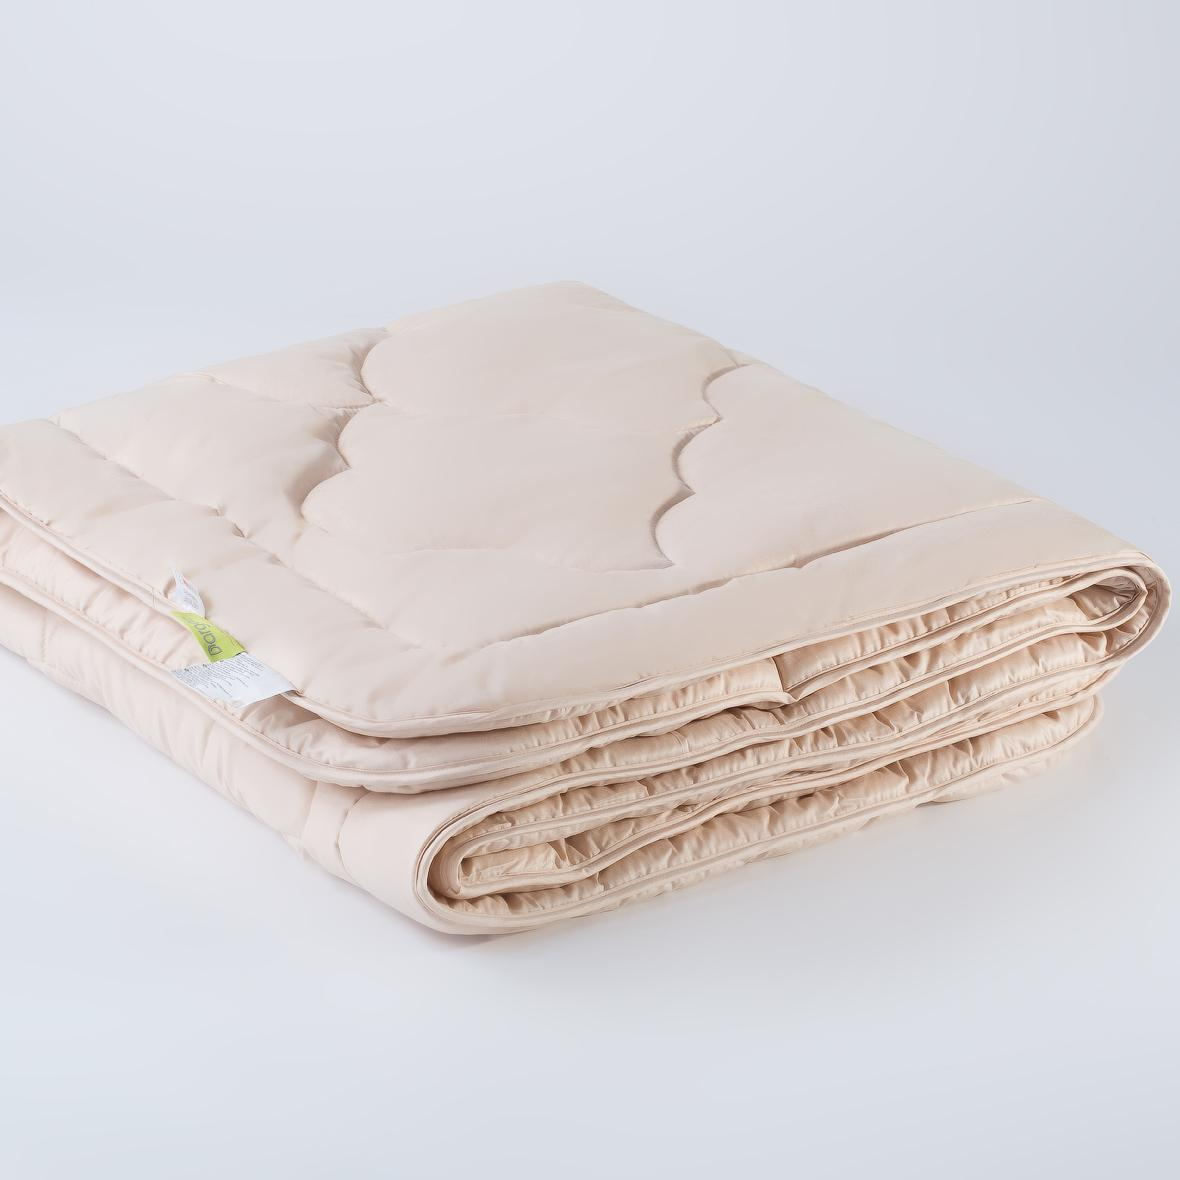 Легкое одеяло из шерсти альпака Даргез Акапулько - Detskoye-Postelnoe.Ru